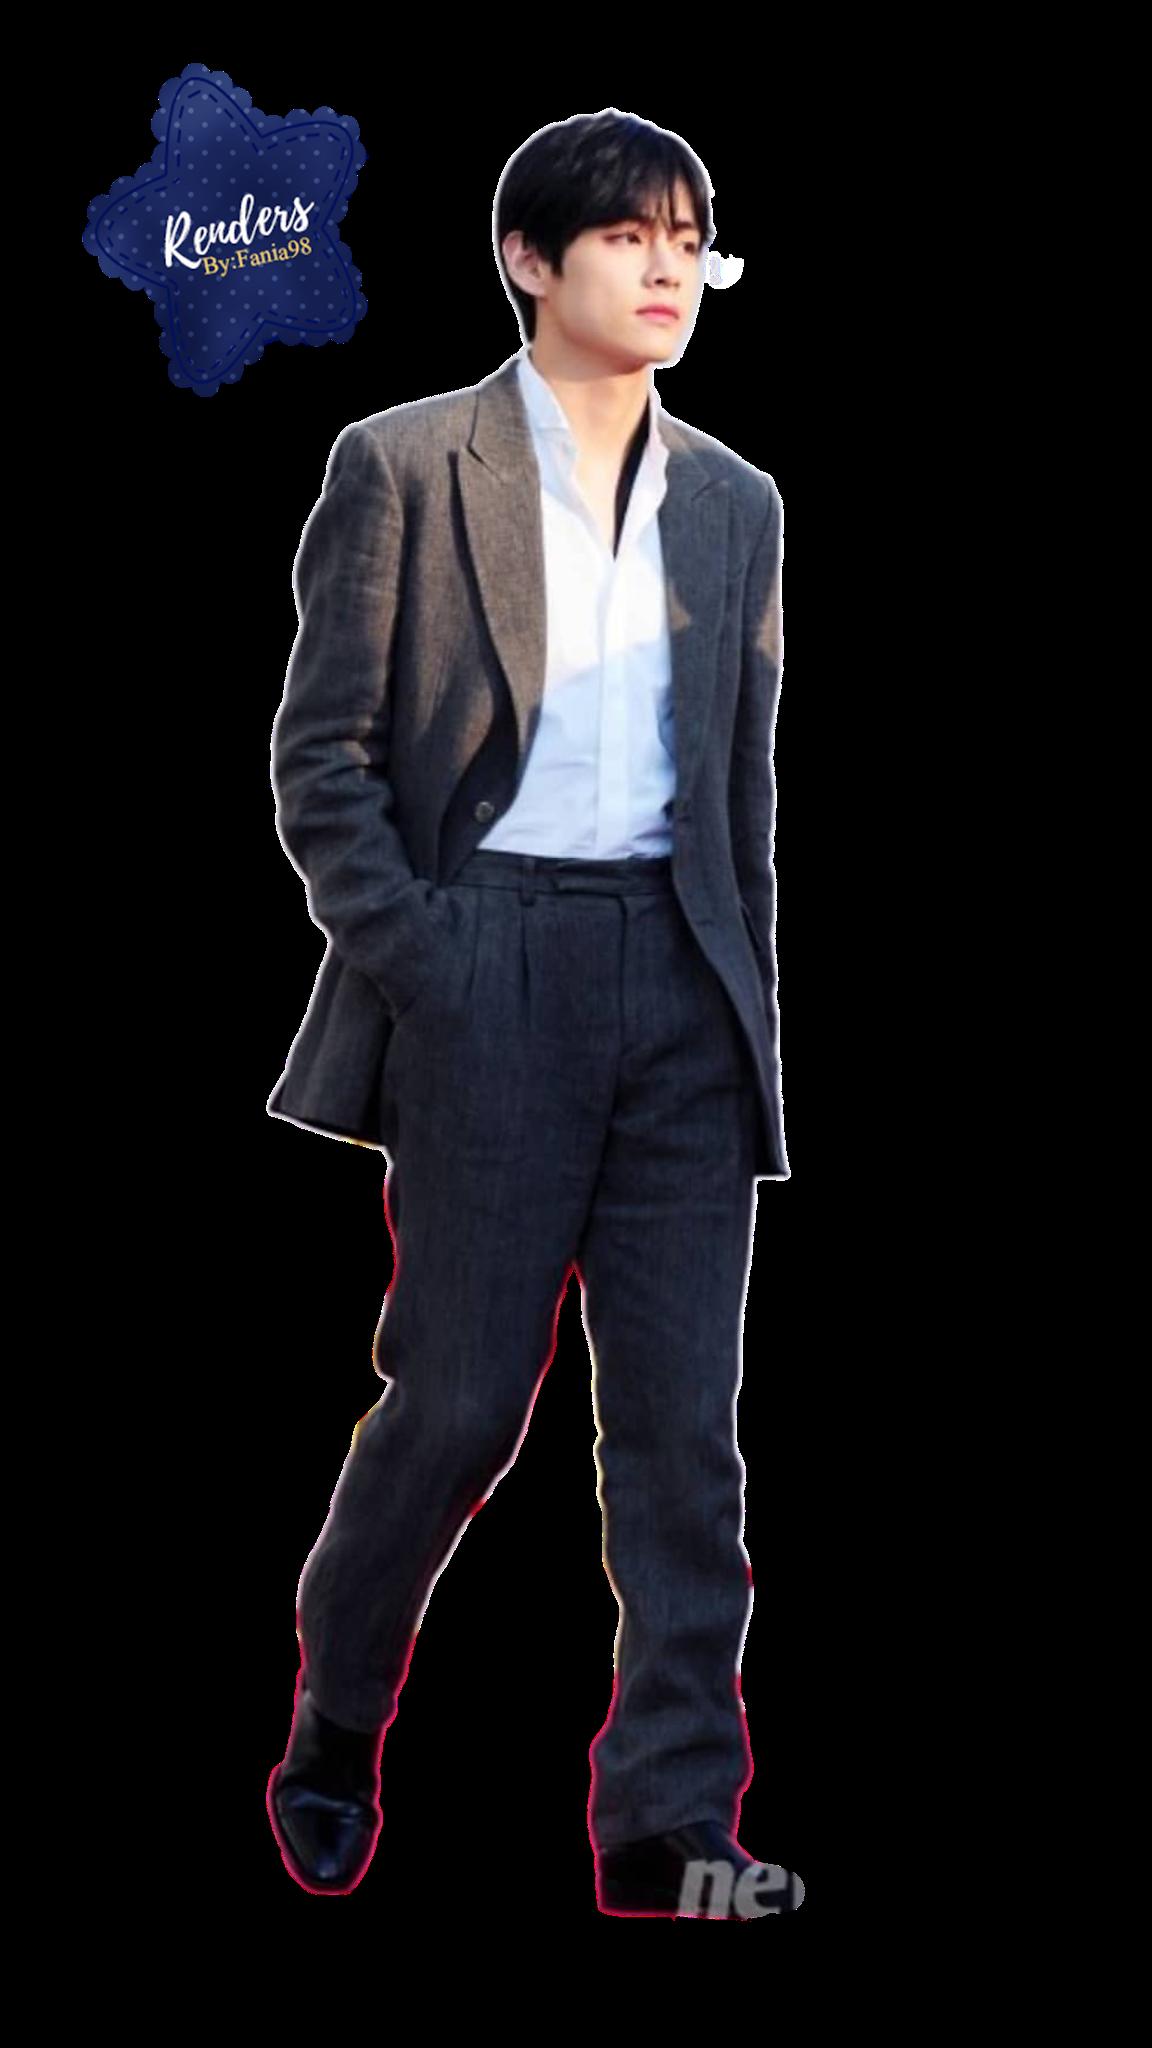 Kim Taehyung